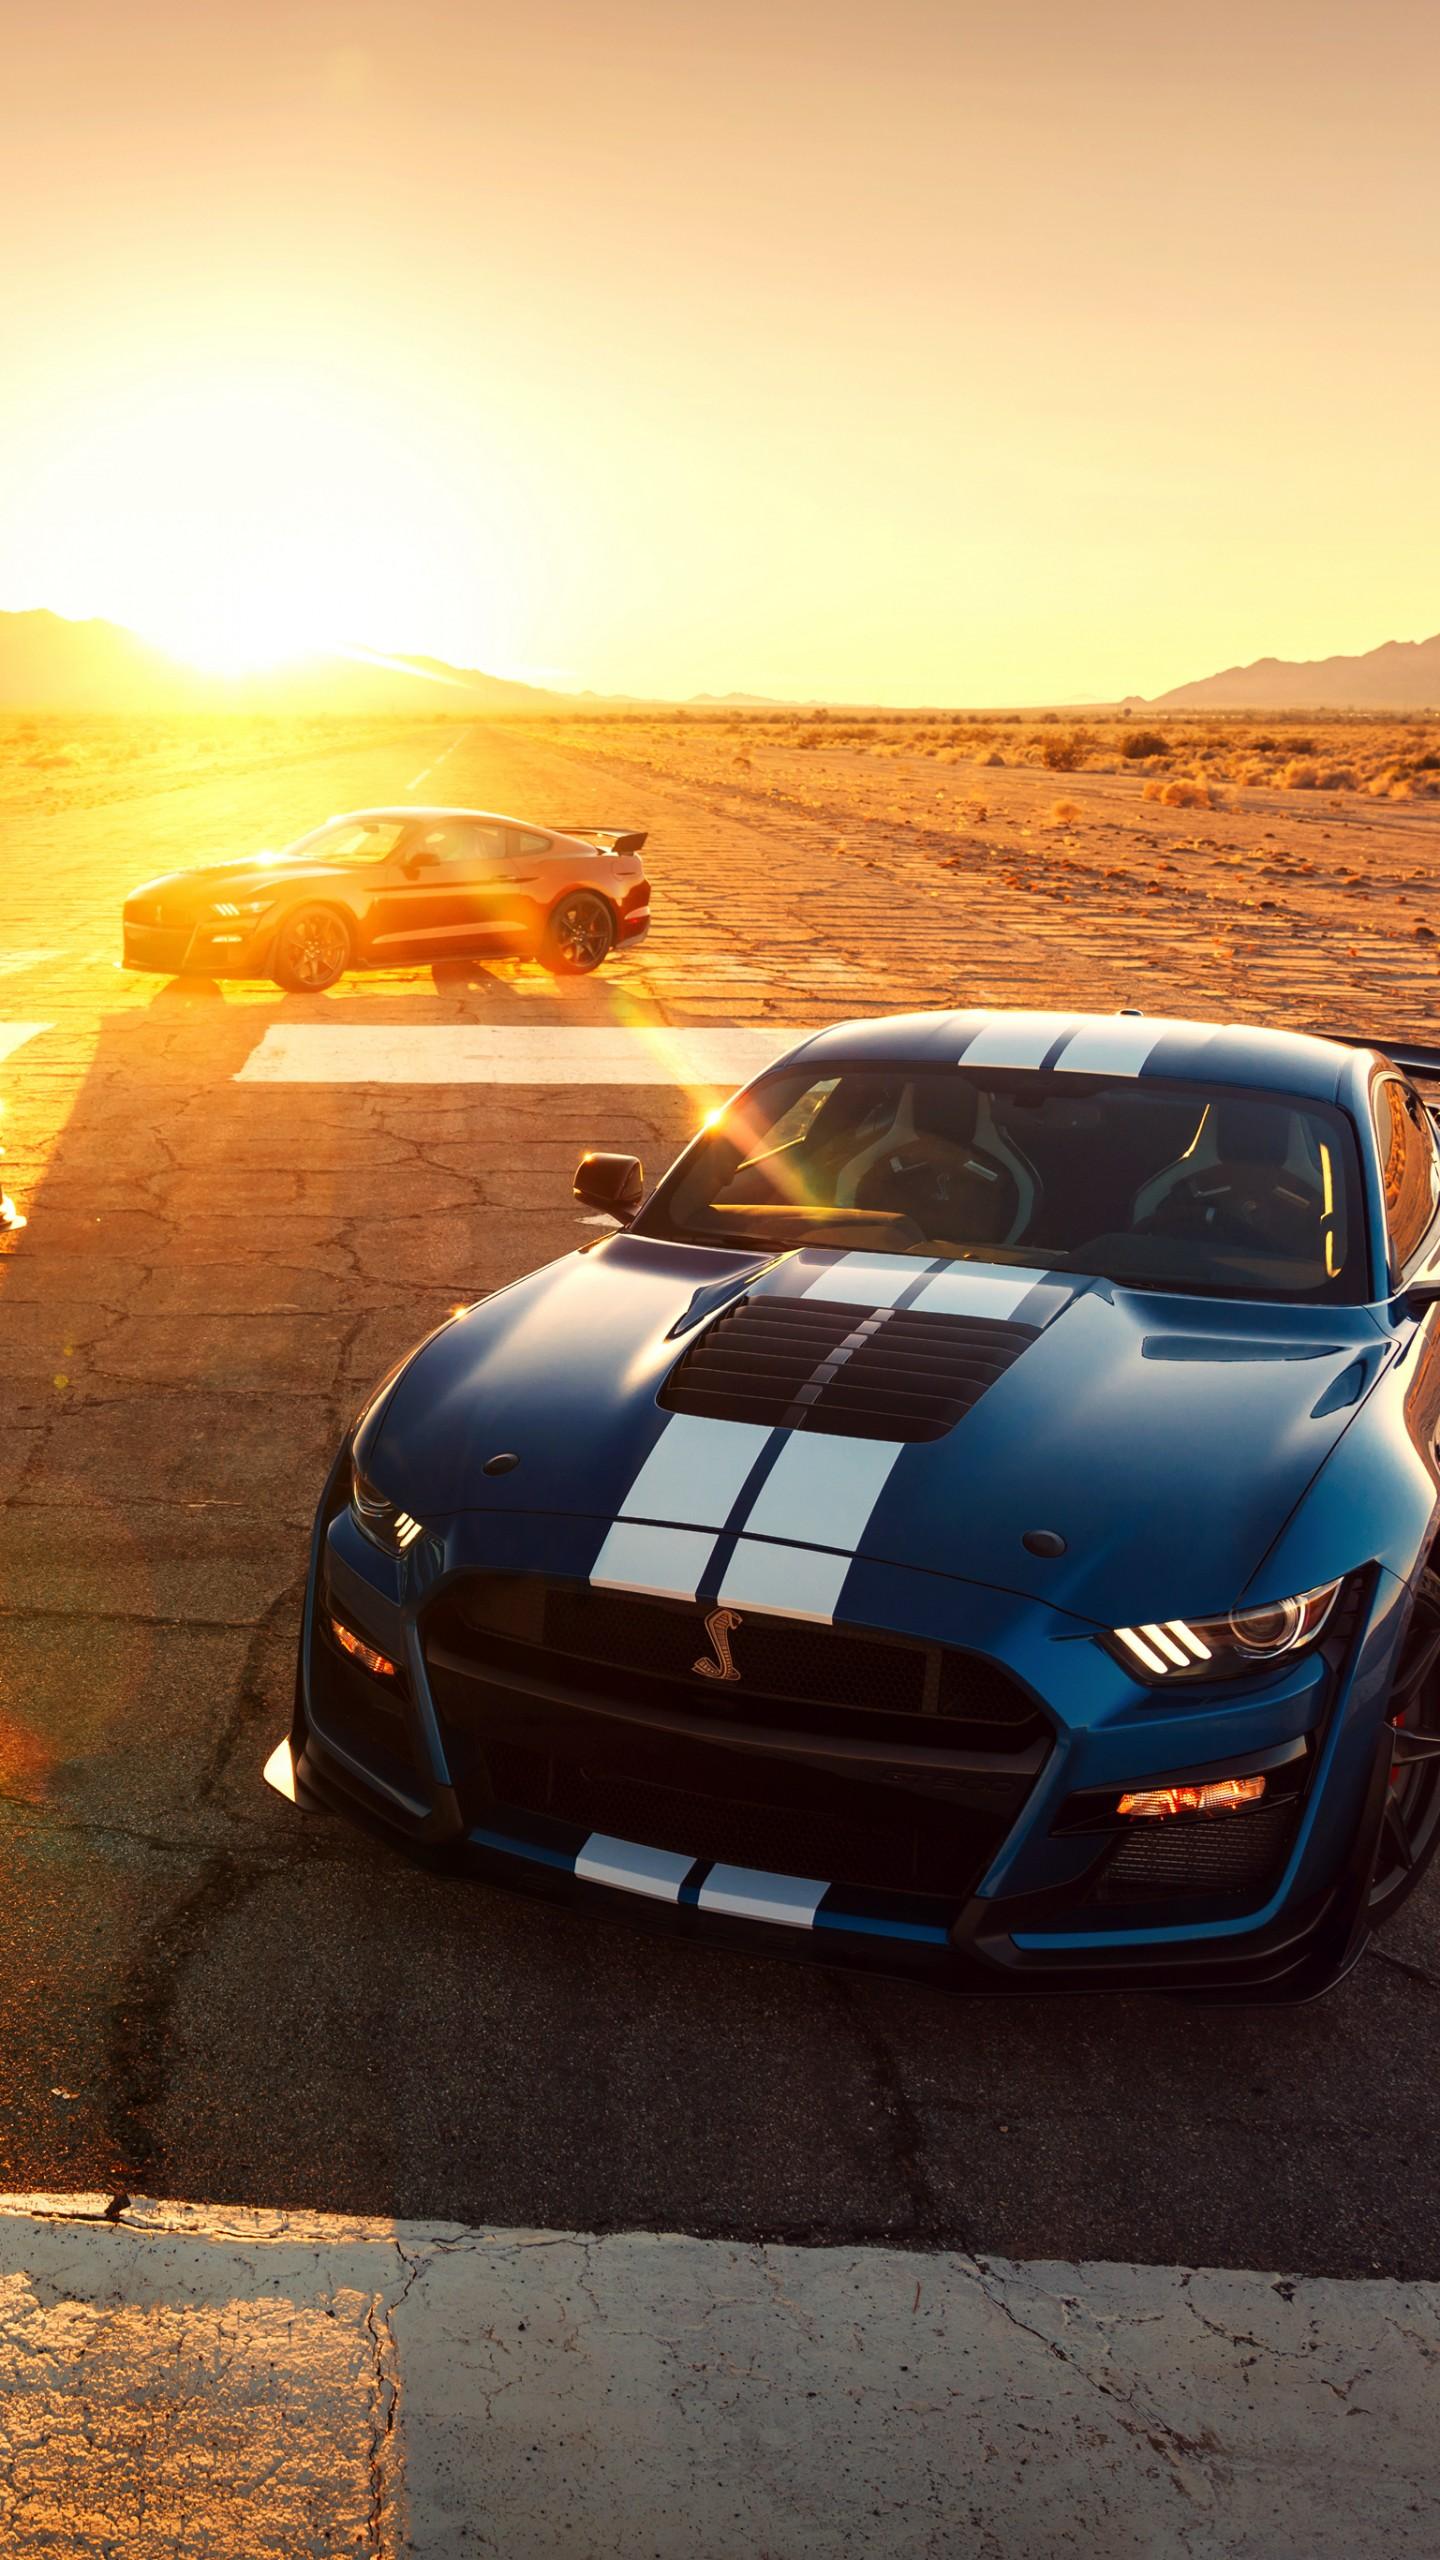 Обои Ford Mustang Shelby GT500, 2020 Cars, 2019 Detroit Auto Show, 4K, Авто и Мото #21061